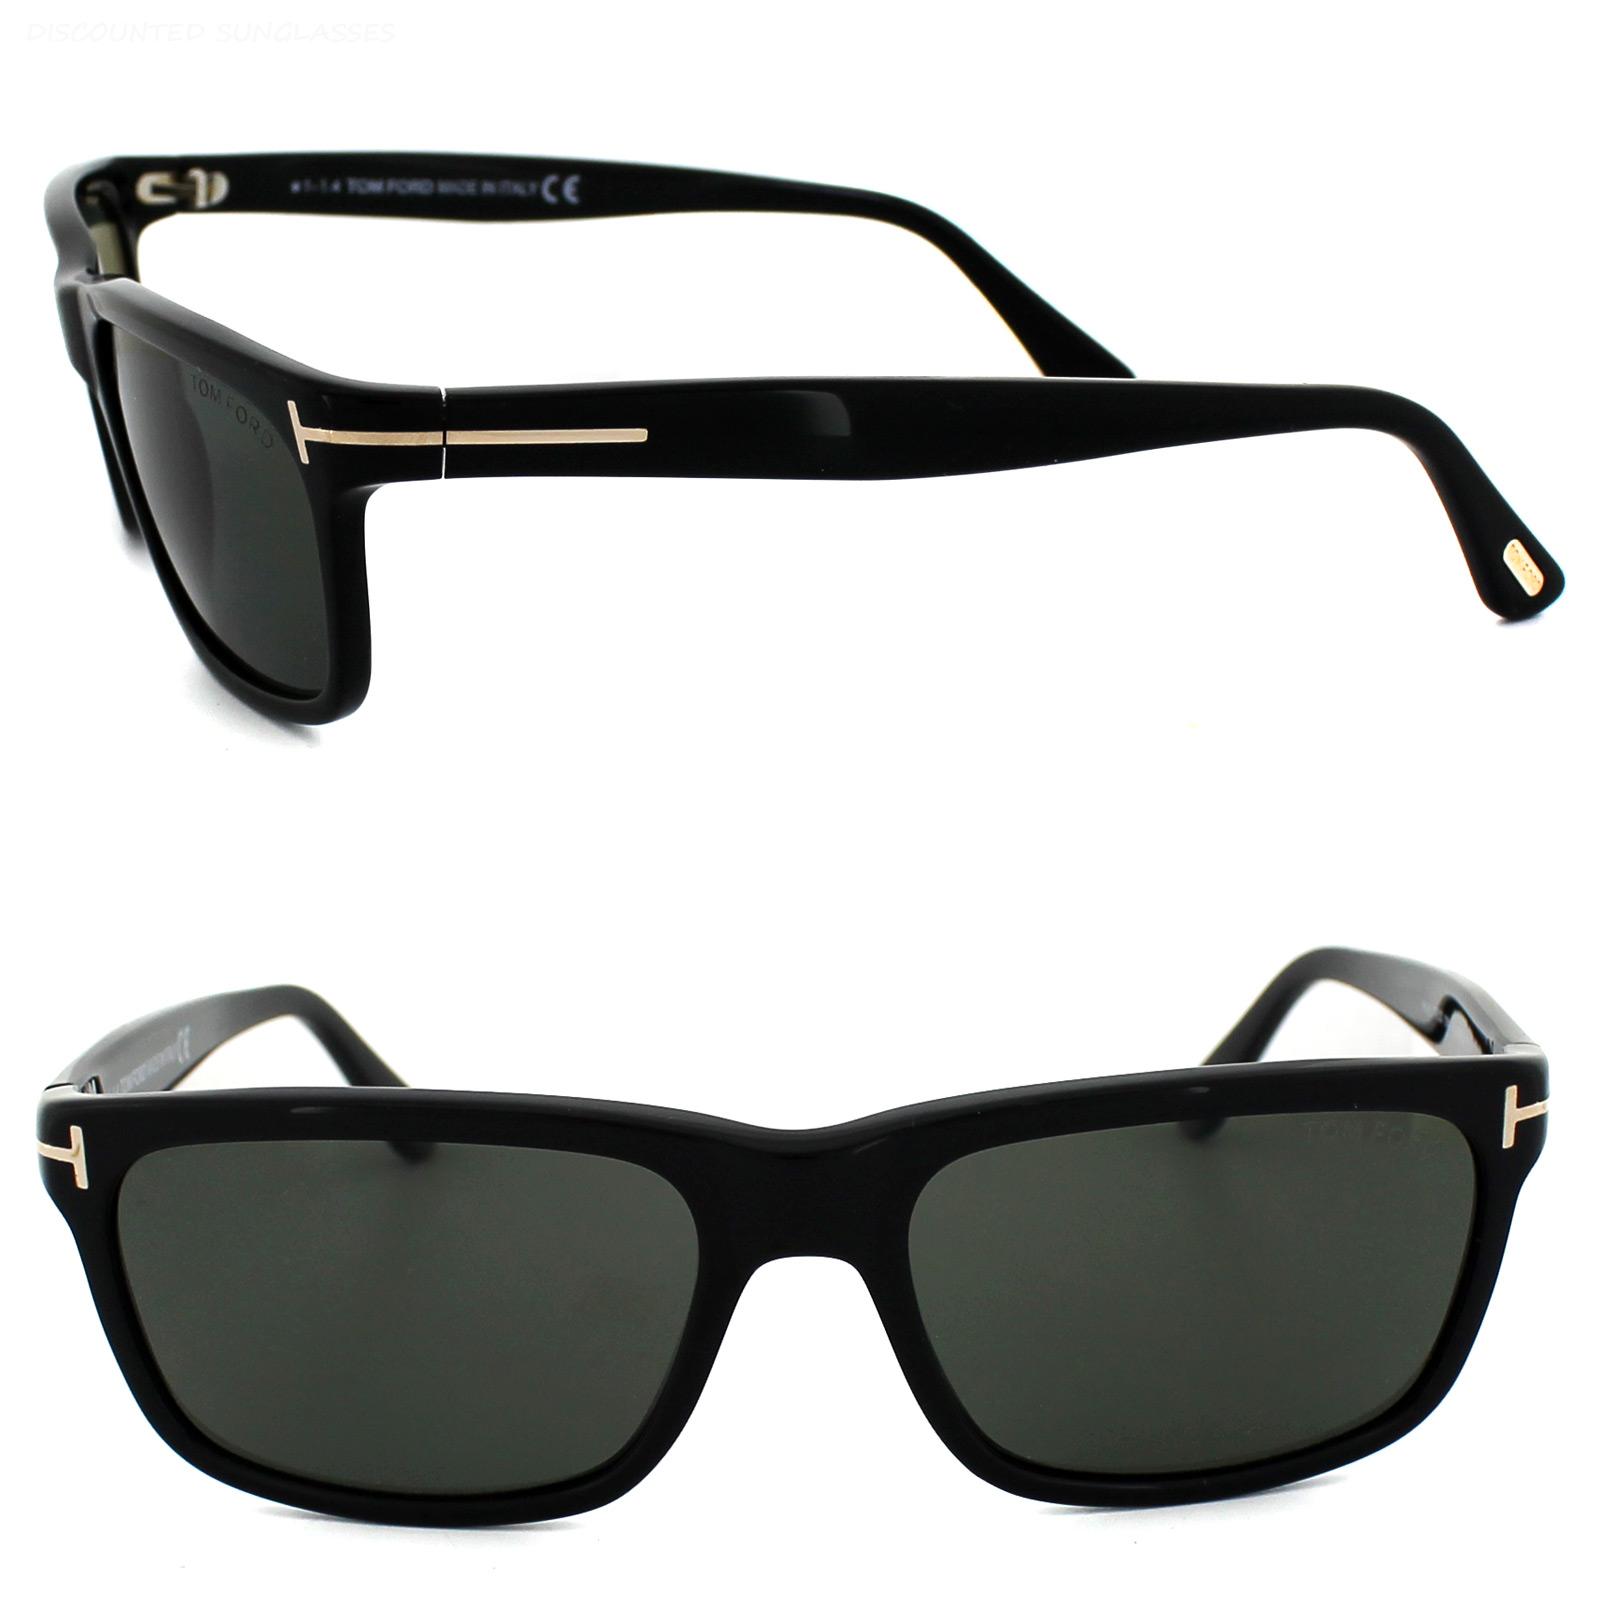 Cheap Tom Ford 0337 Hugh Sunglasses Discounted Sunglasses